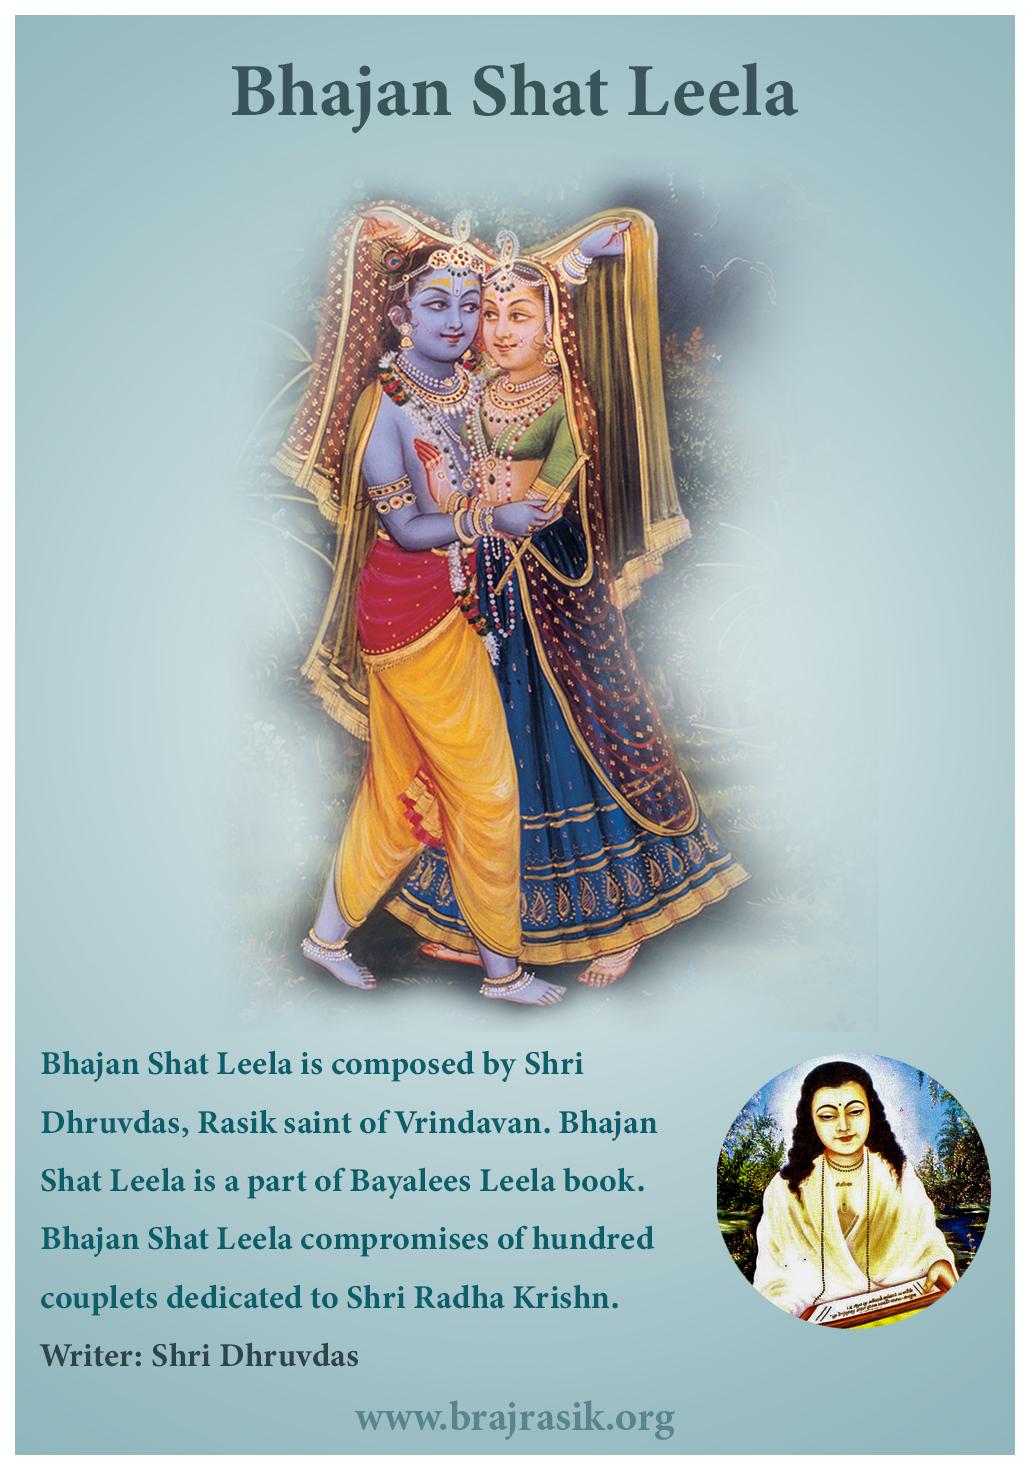 Bhajan Shat Leela